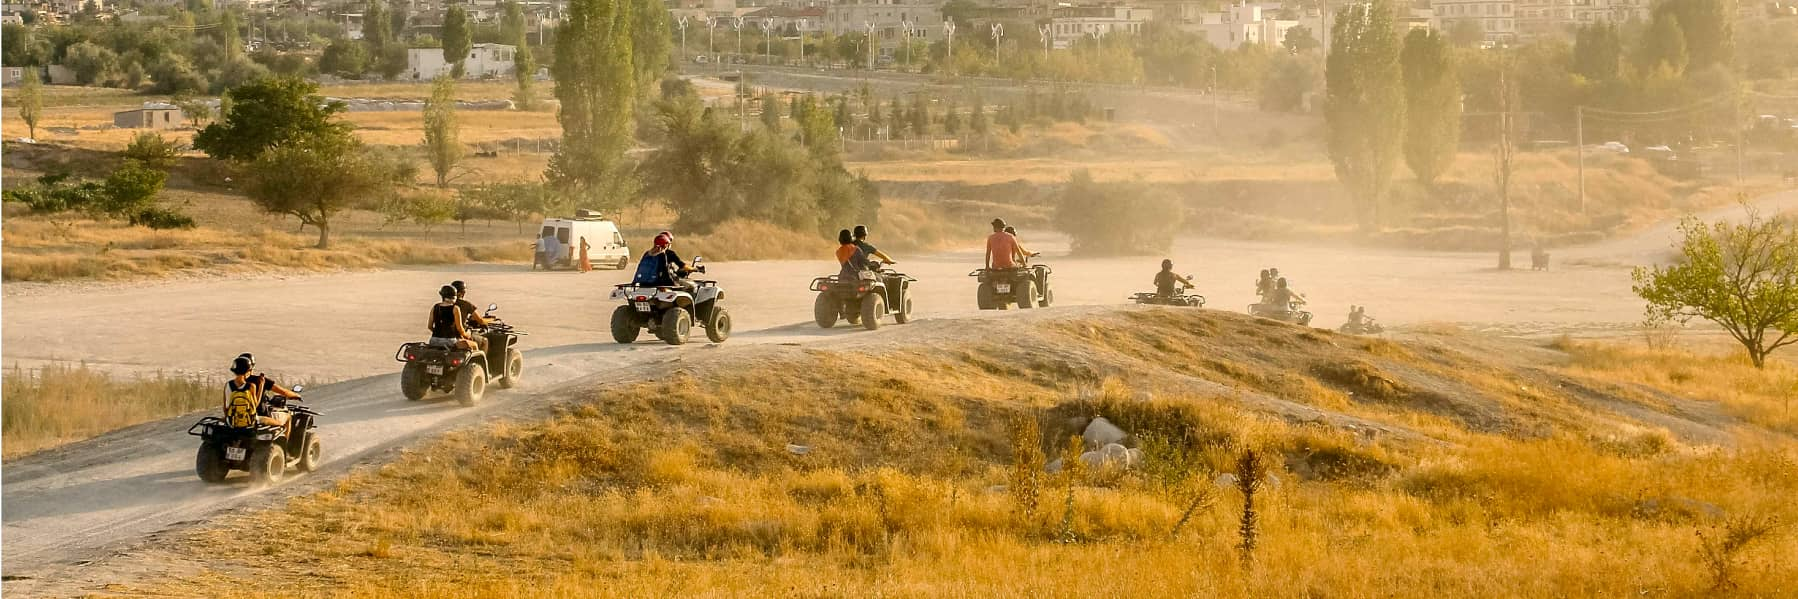 Siem Reap Quad Bike Sunset Tour - 1 hour gallery